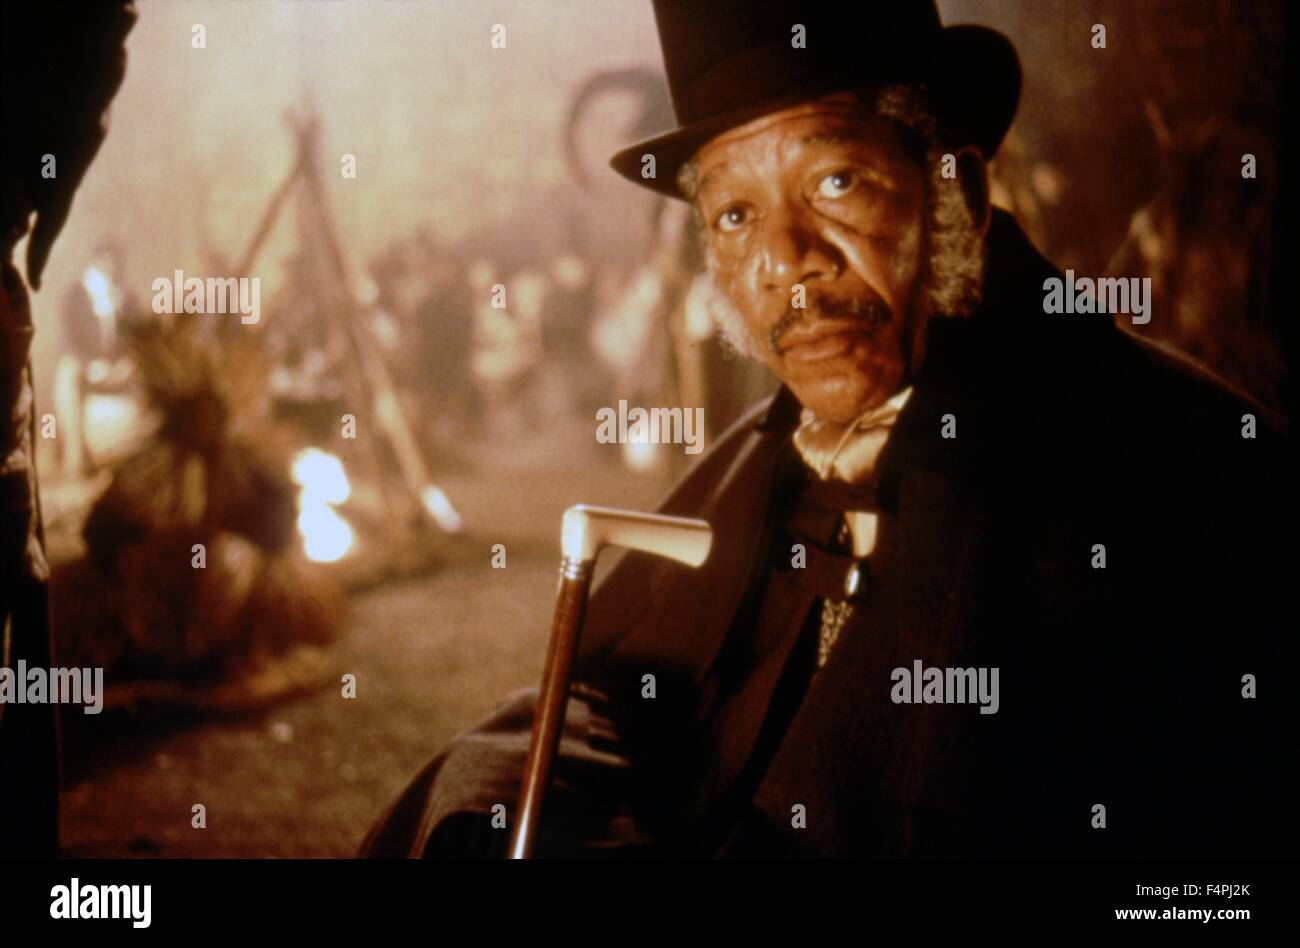 Morgan Freeman / Amistad / 1997 dirigida por Steven Spielberg [Dreamworks Pictures] Imagen De Stock